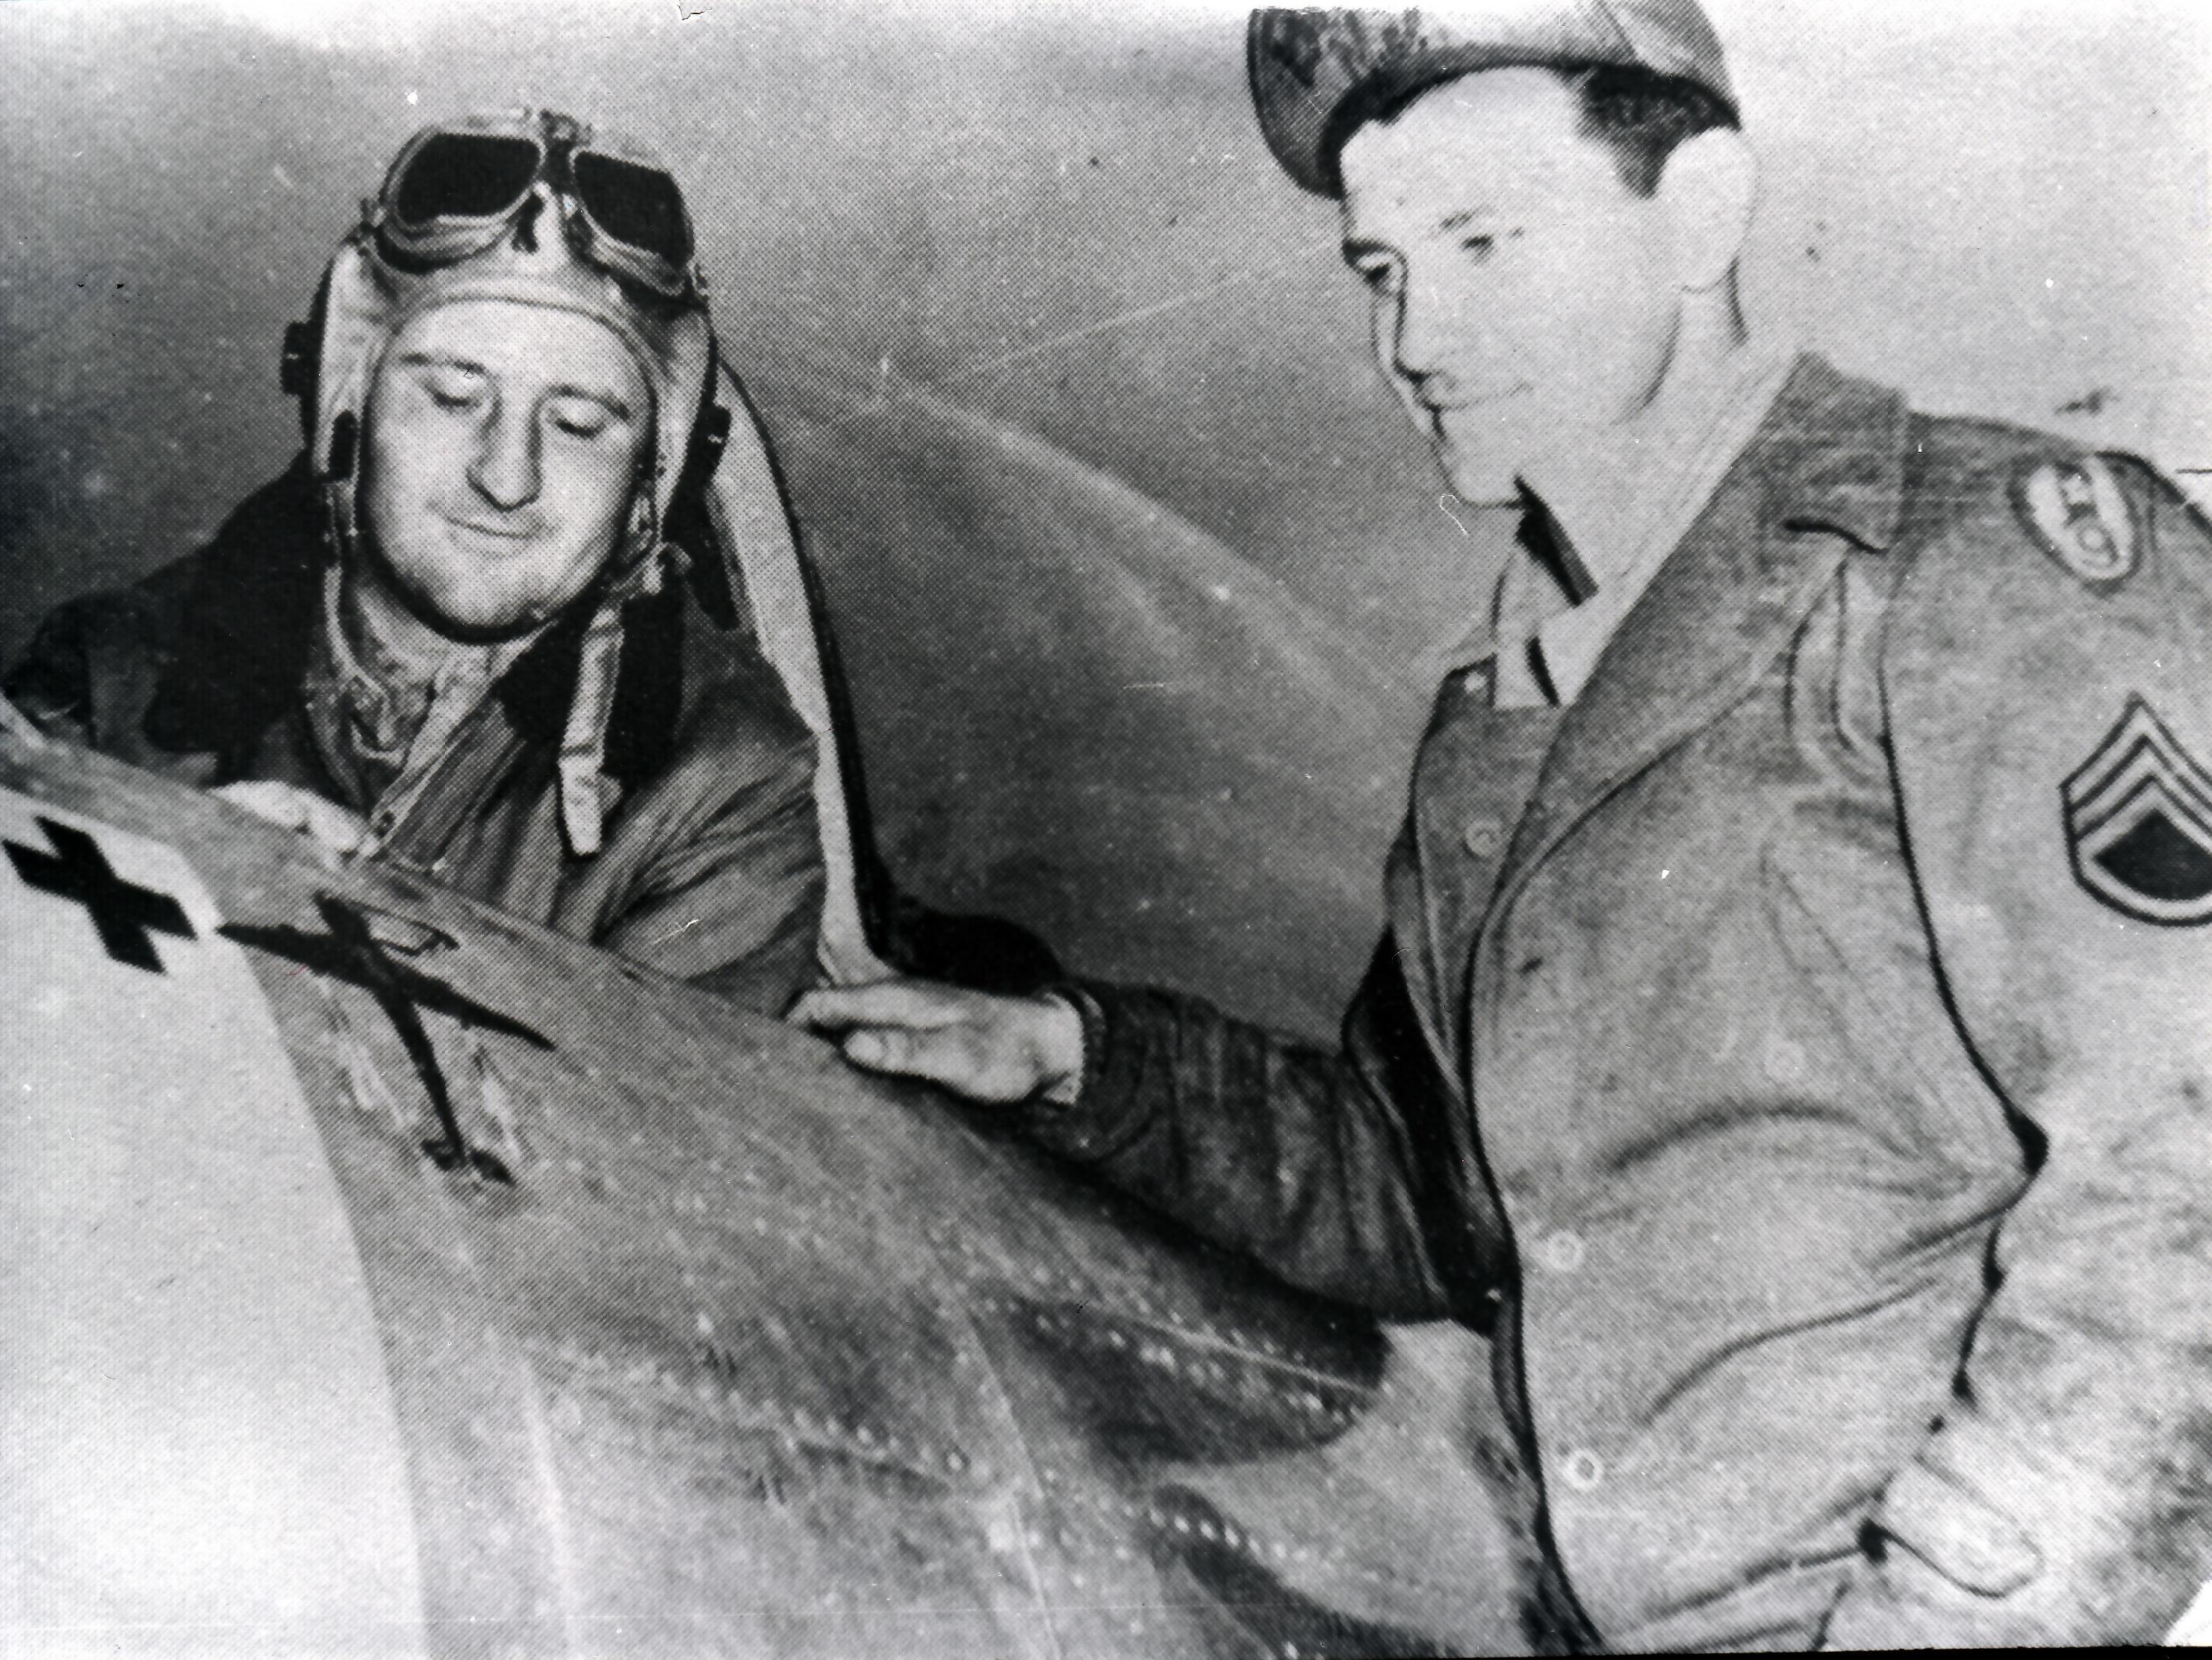 Capt Valmore J. Beaudrualt & CC Sgt Bruno Kupis- Priscilla Beaudrault